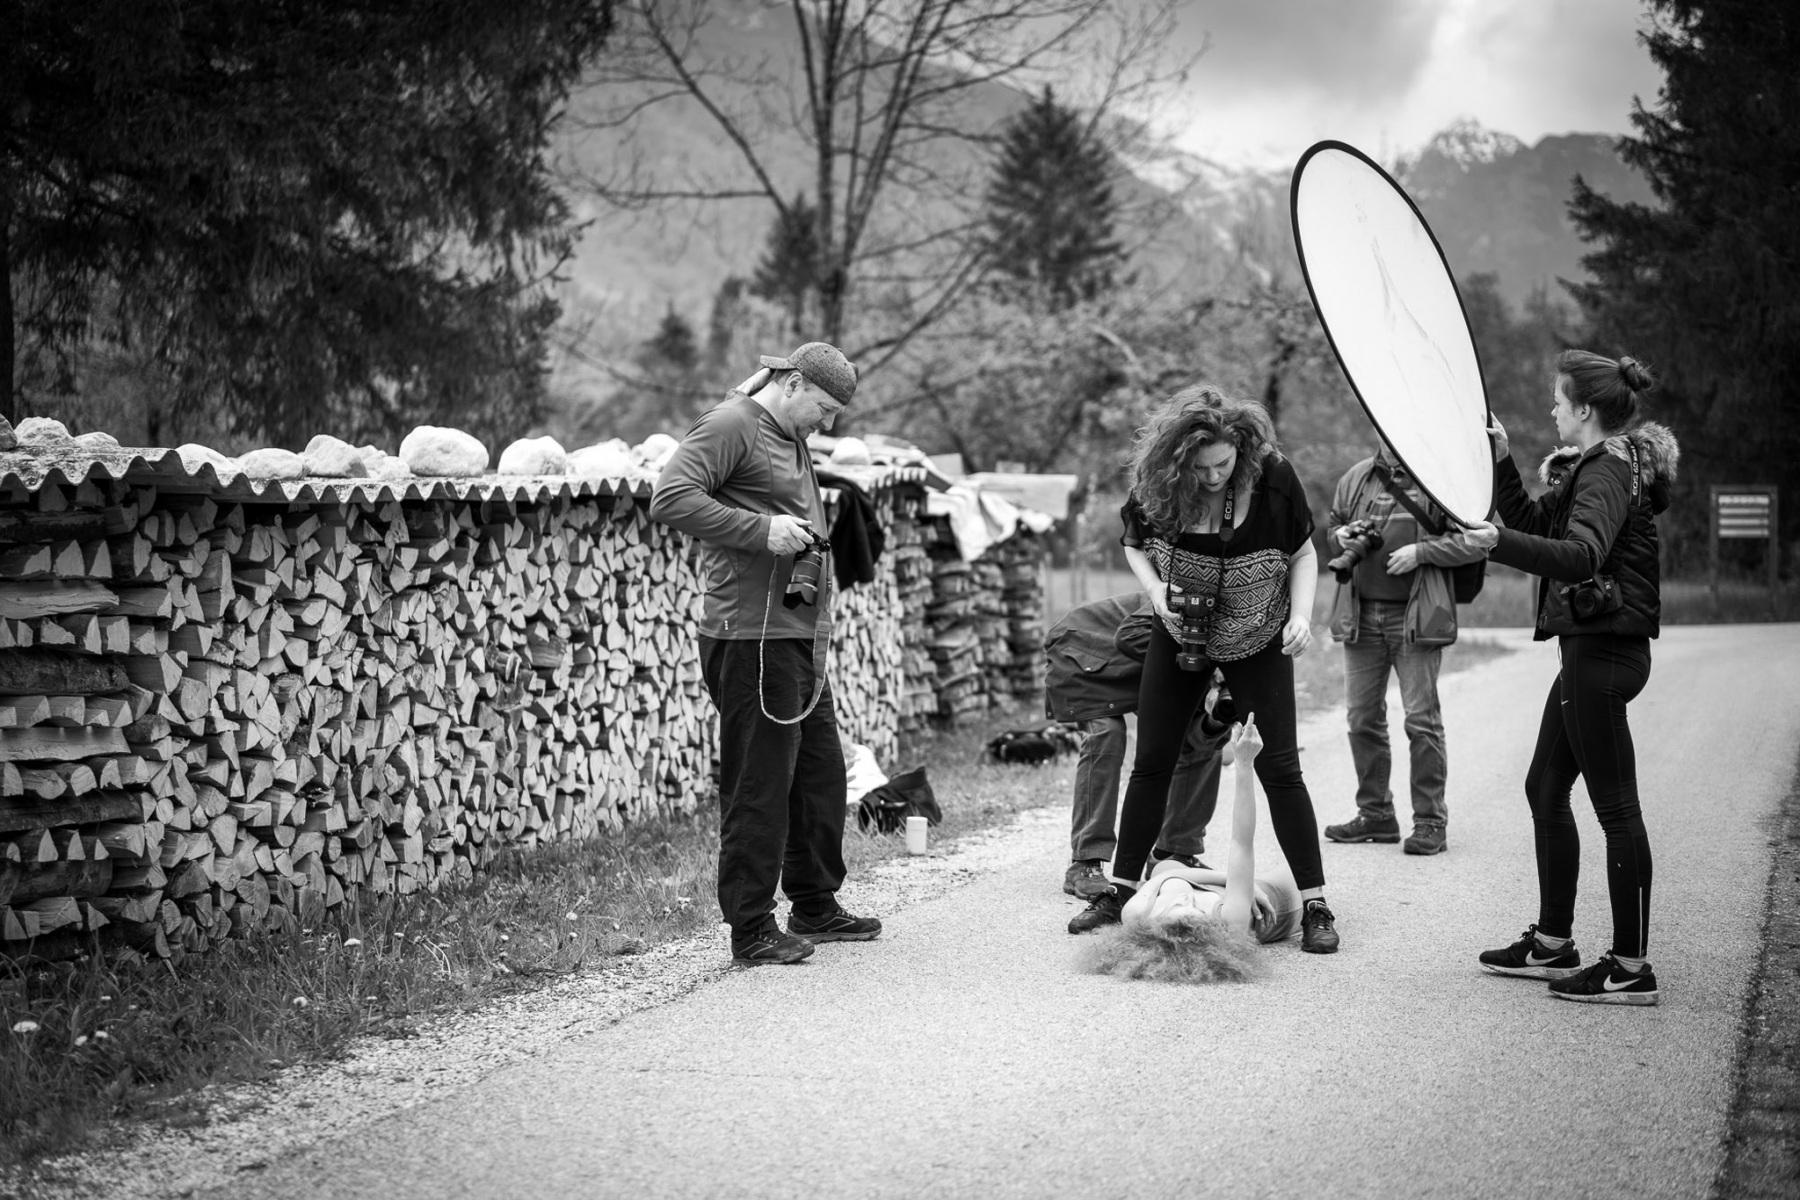 Katerina_Janisova_Masterclass_Workshop_Fotokurz-22